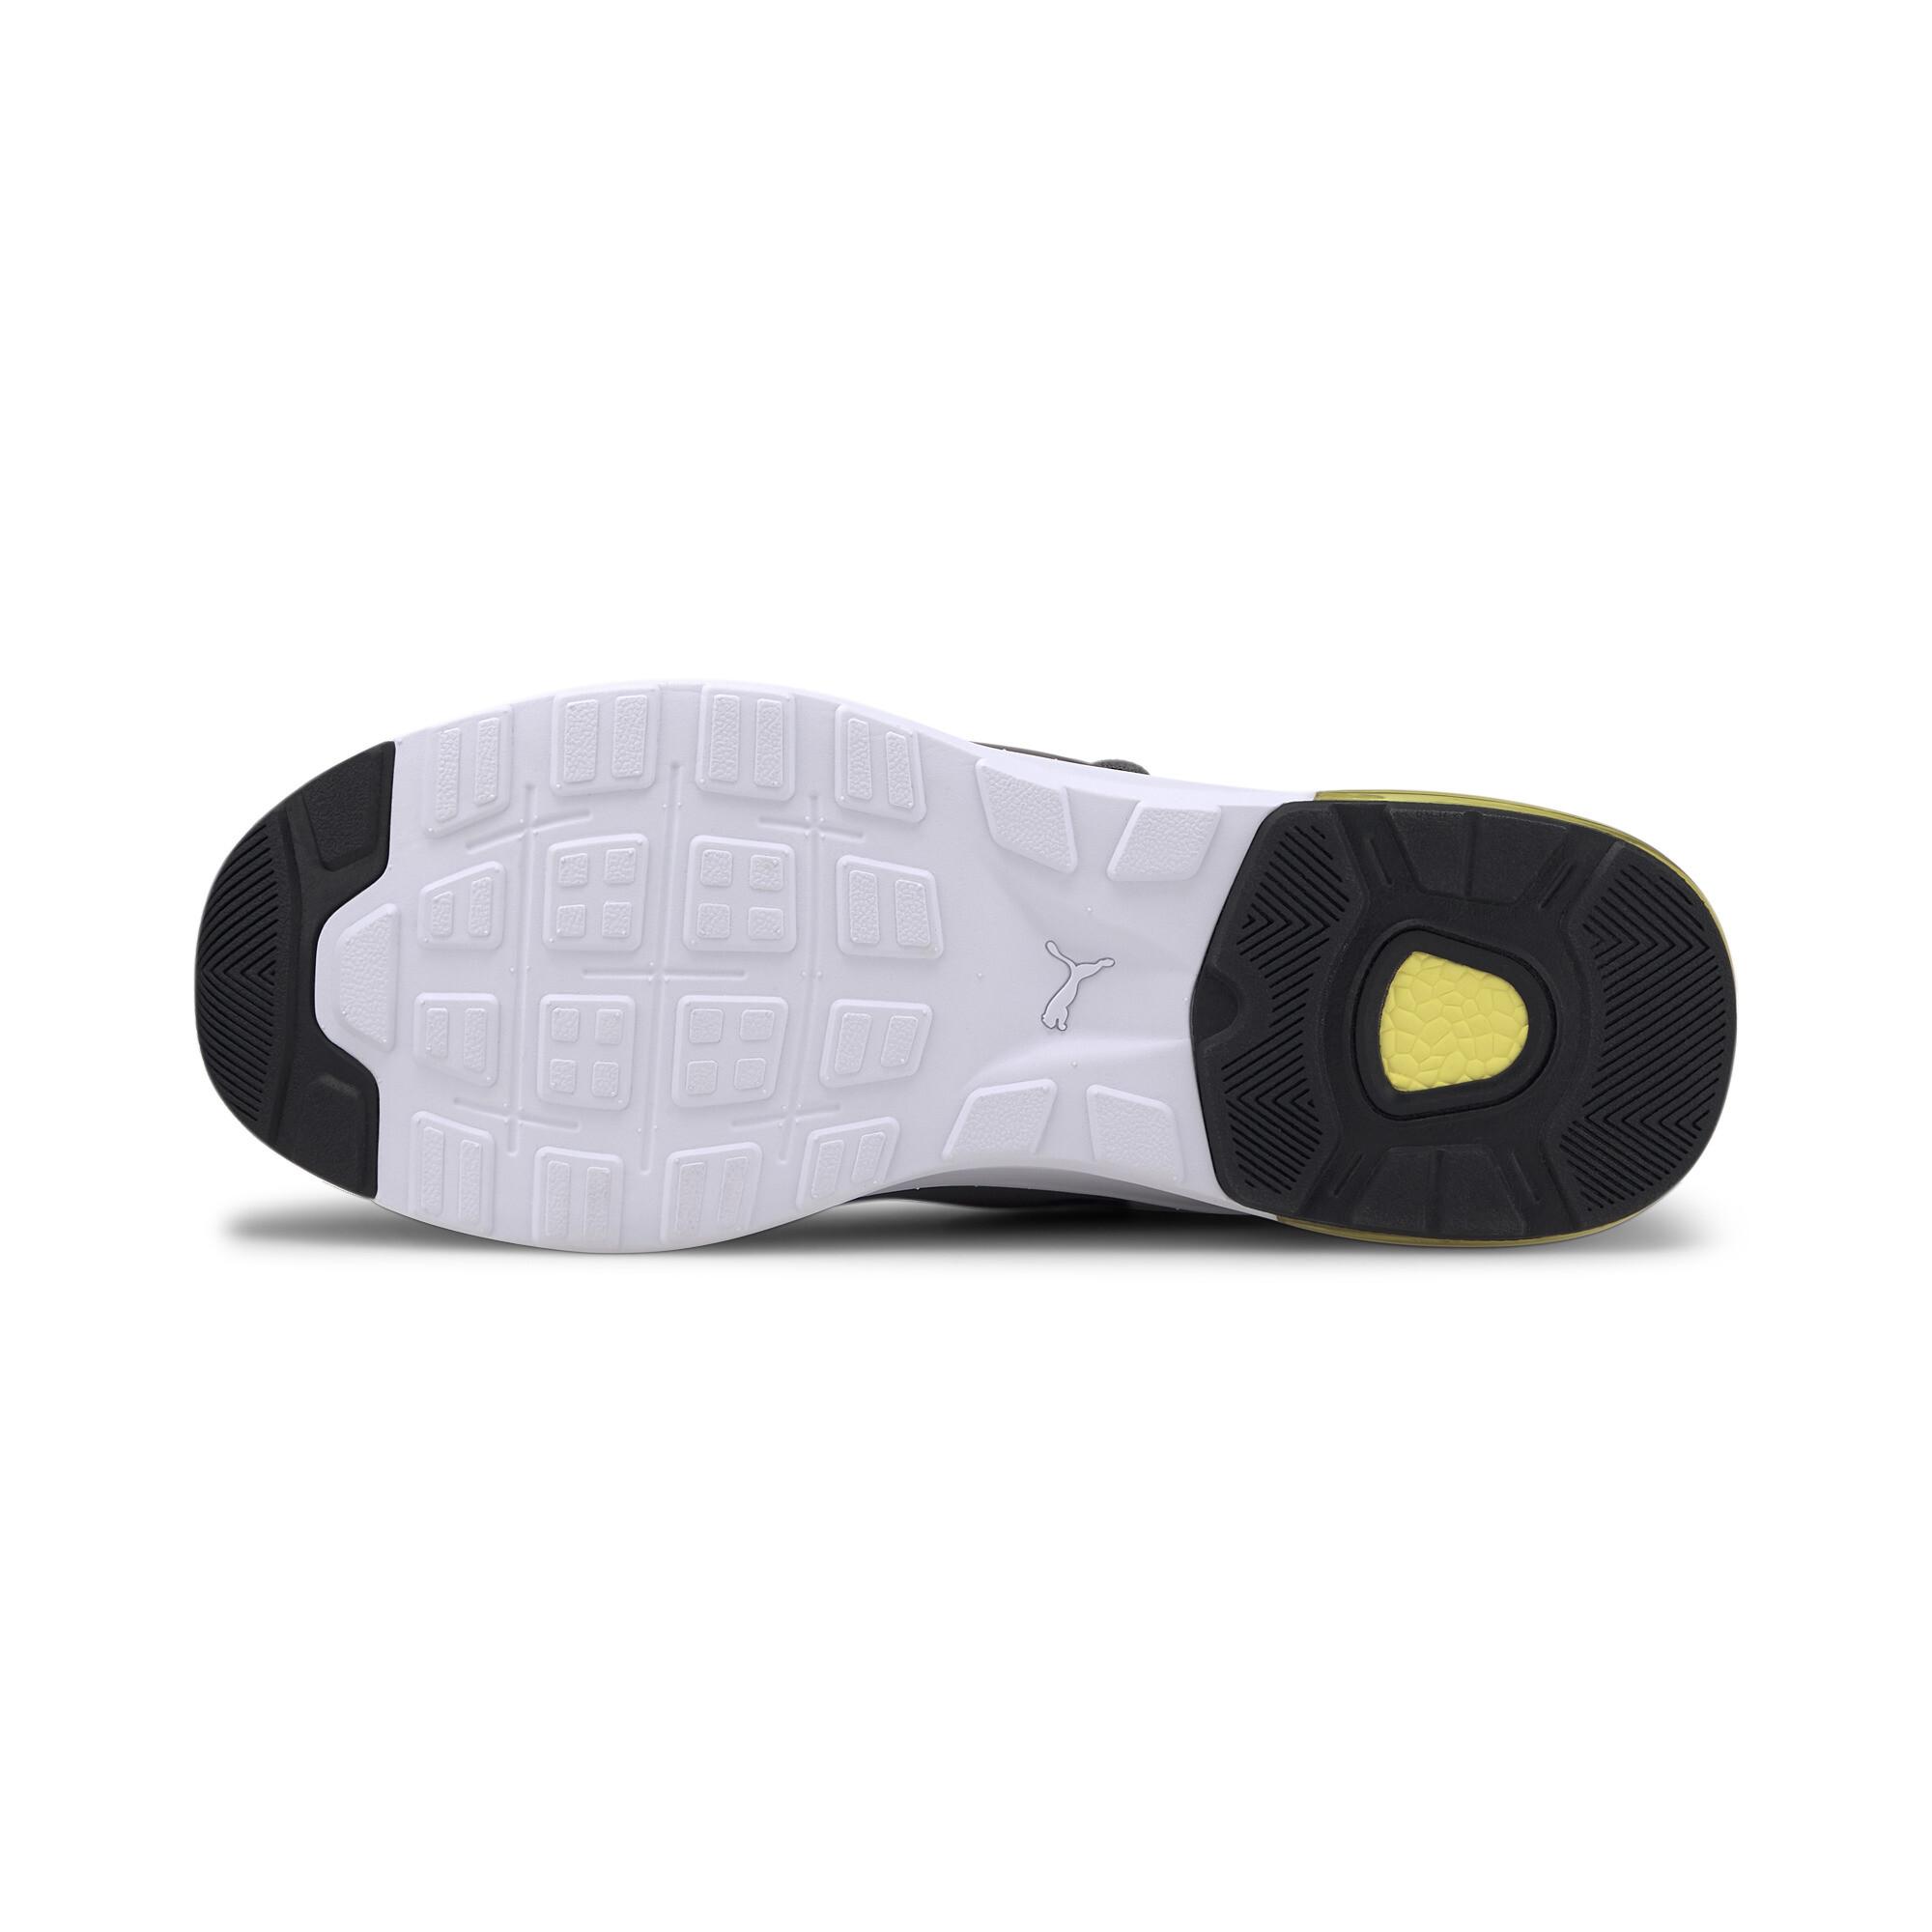 PUMA-Electron-Street-Men-039-s-Sneakers-Men-Shoe-Basics thumbnail 25